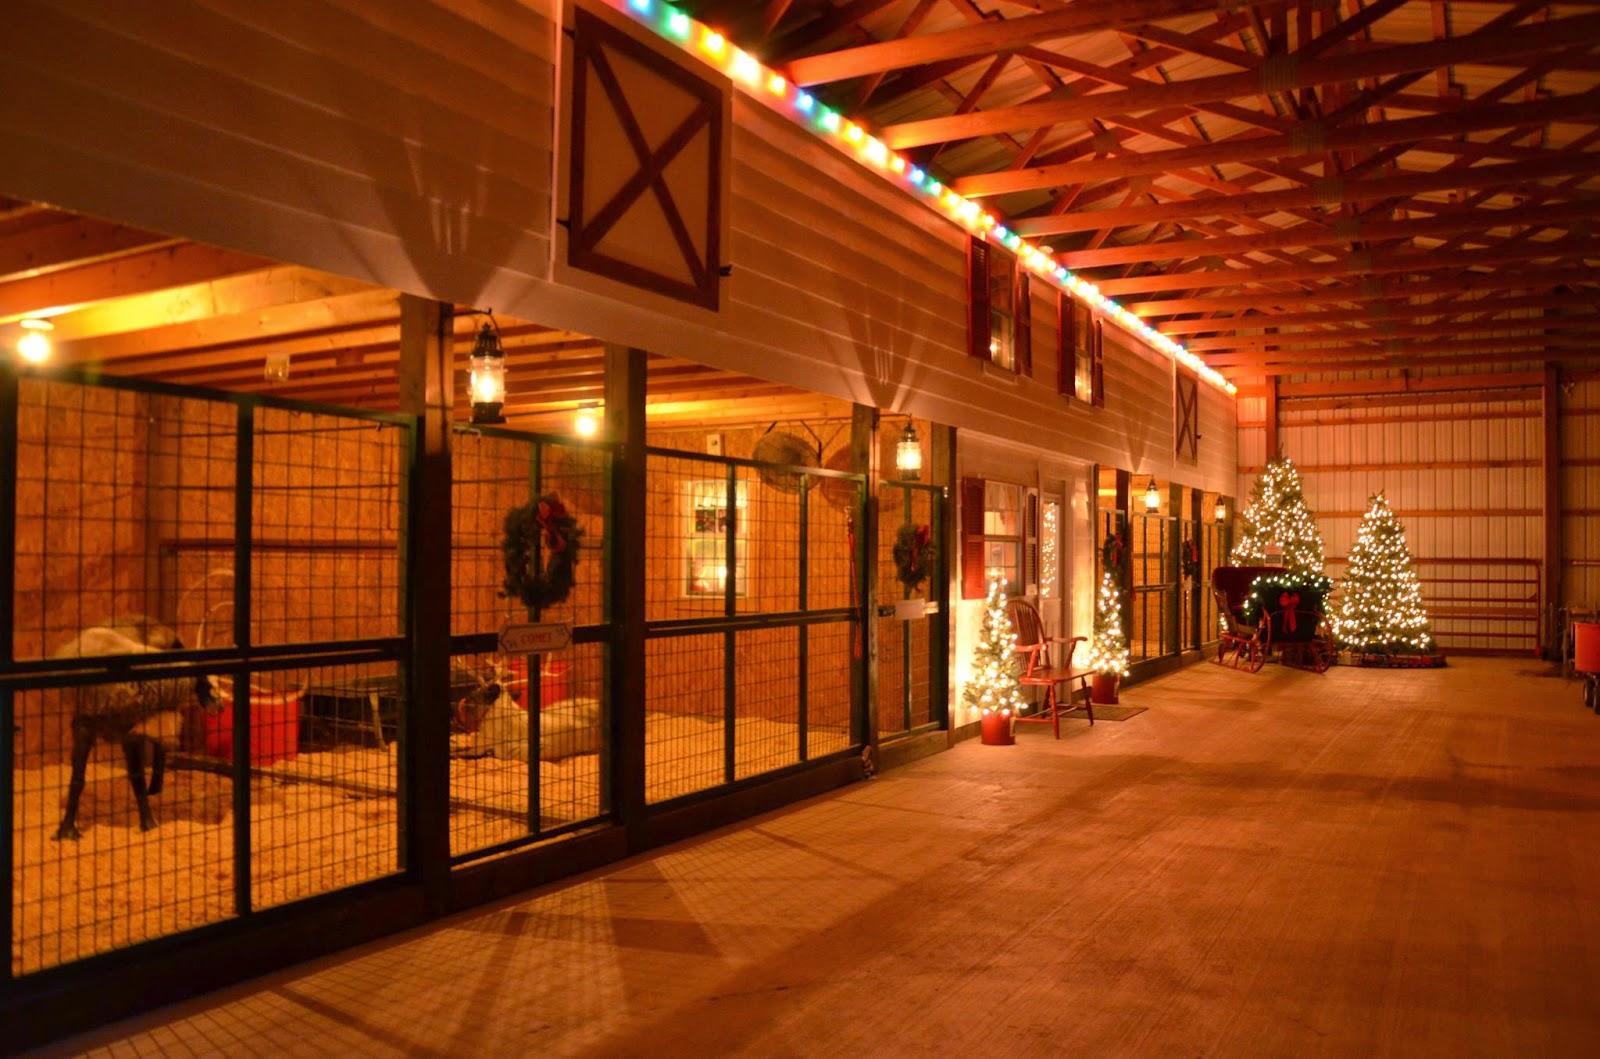 Central Division News National Barn Company Builds Custom Post Frame Pole Barn For Double R